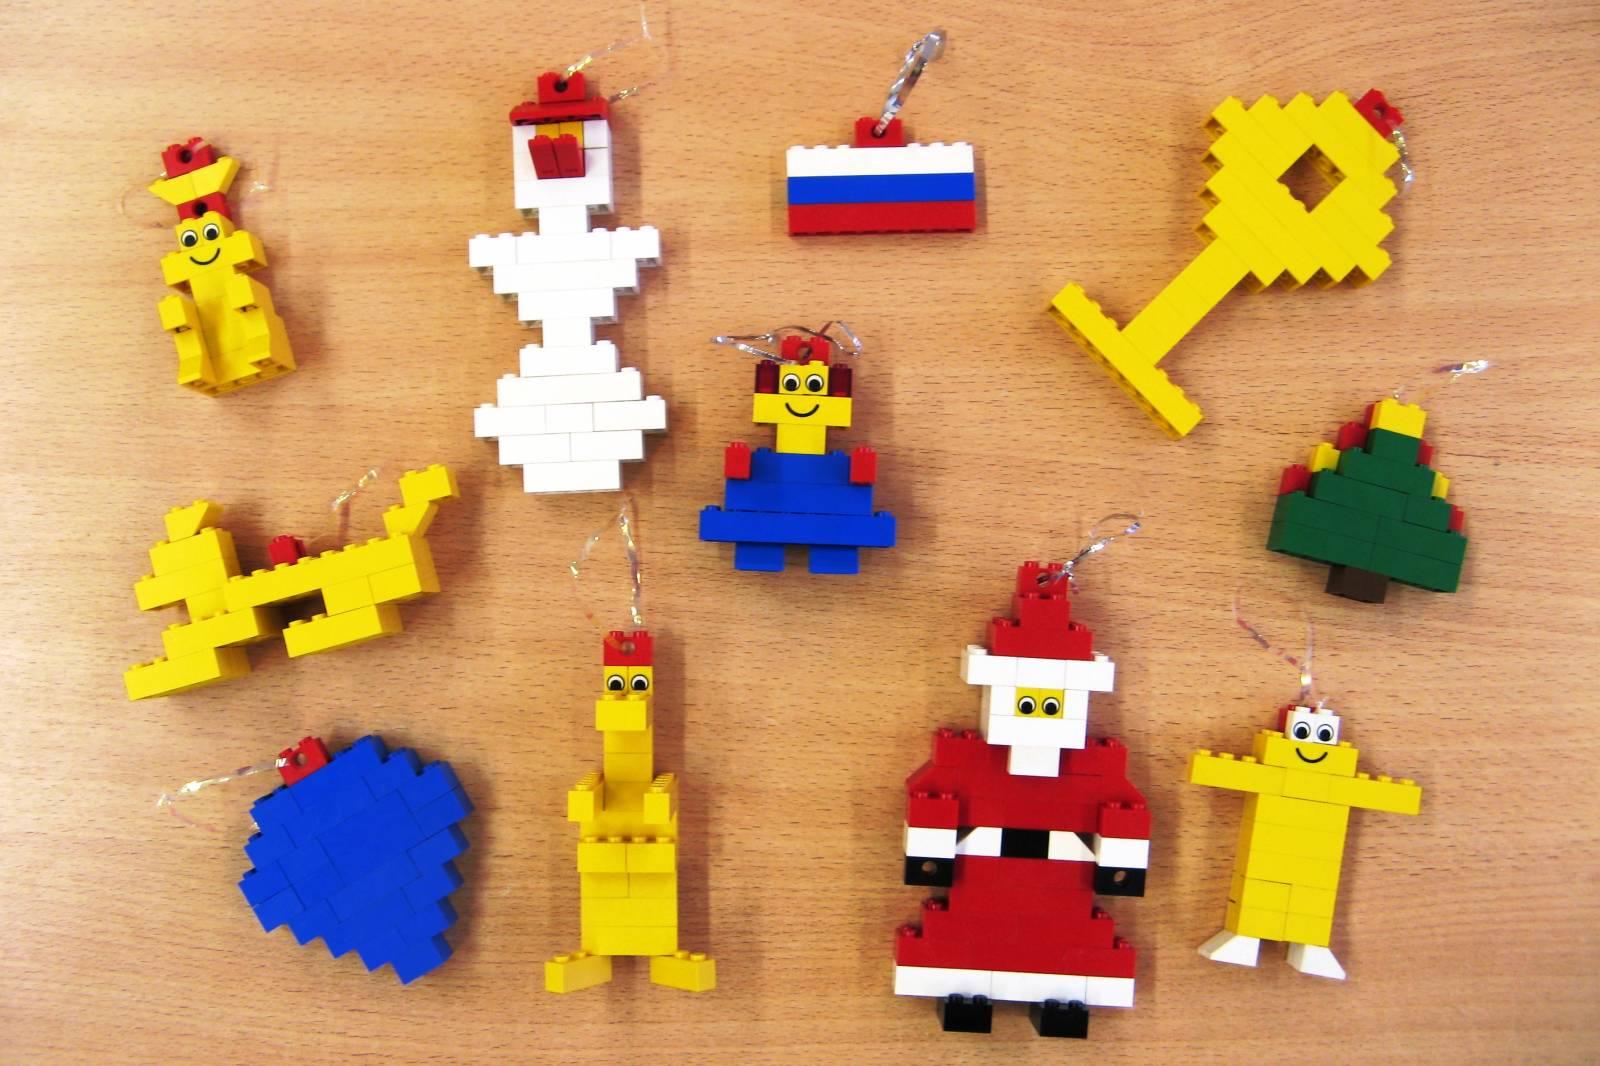 Новогодние игрушки на елку из лего